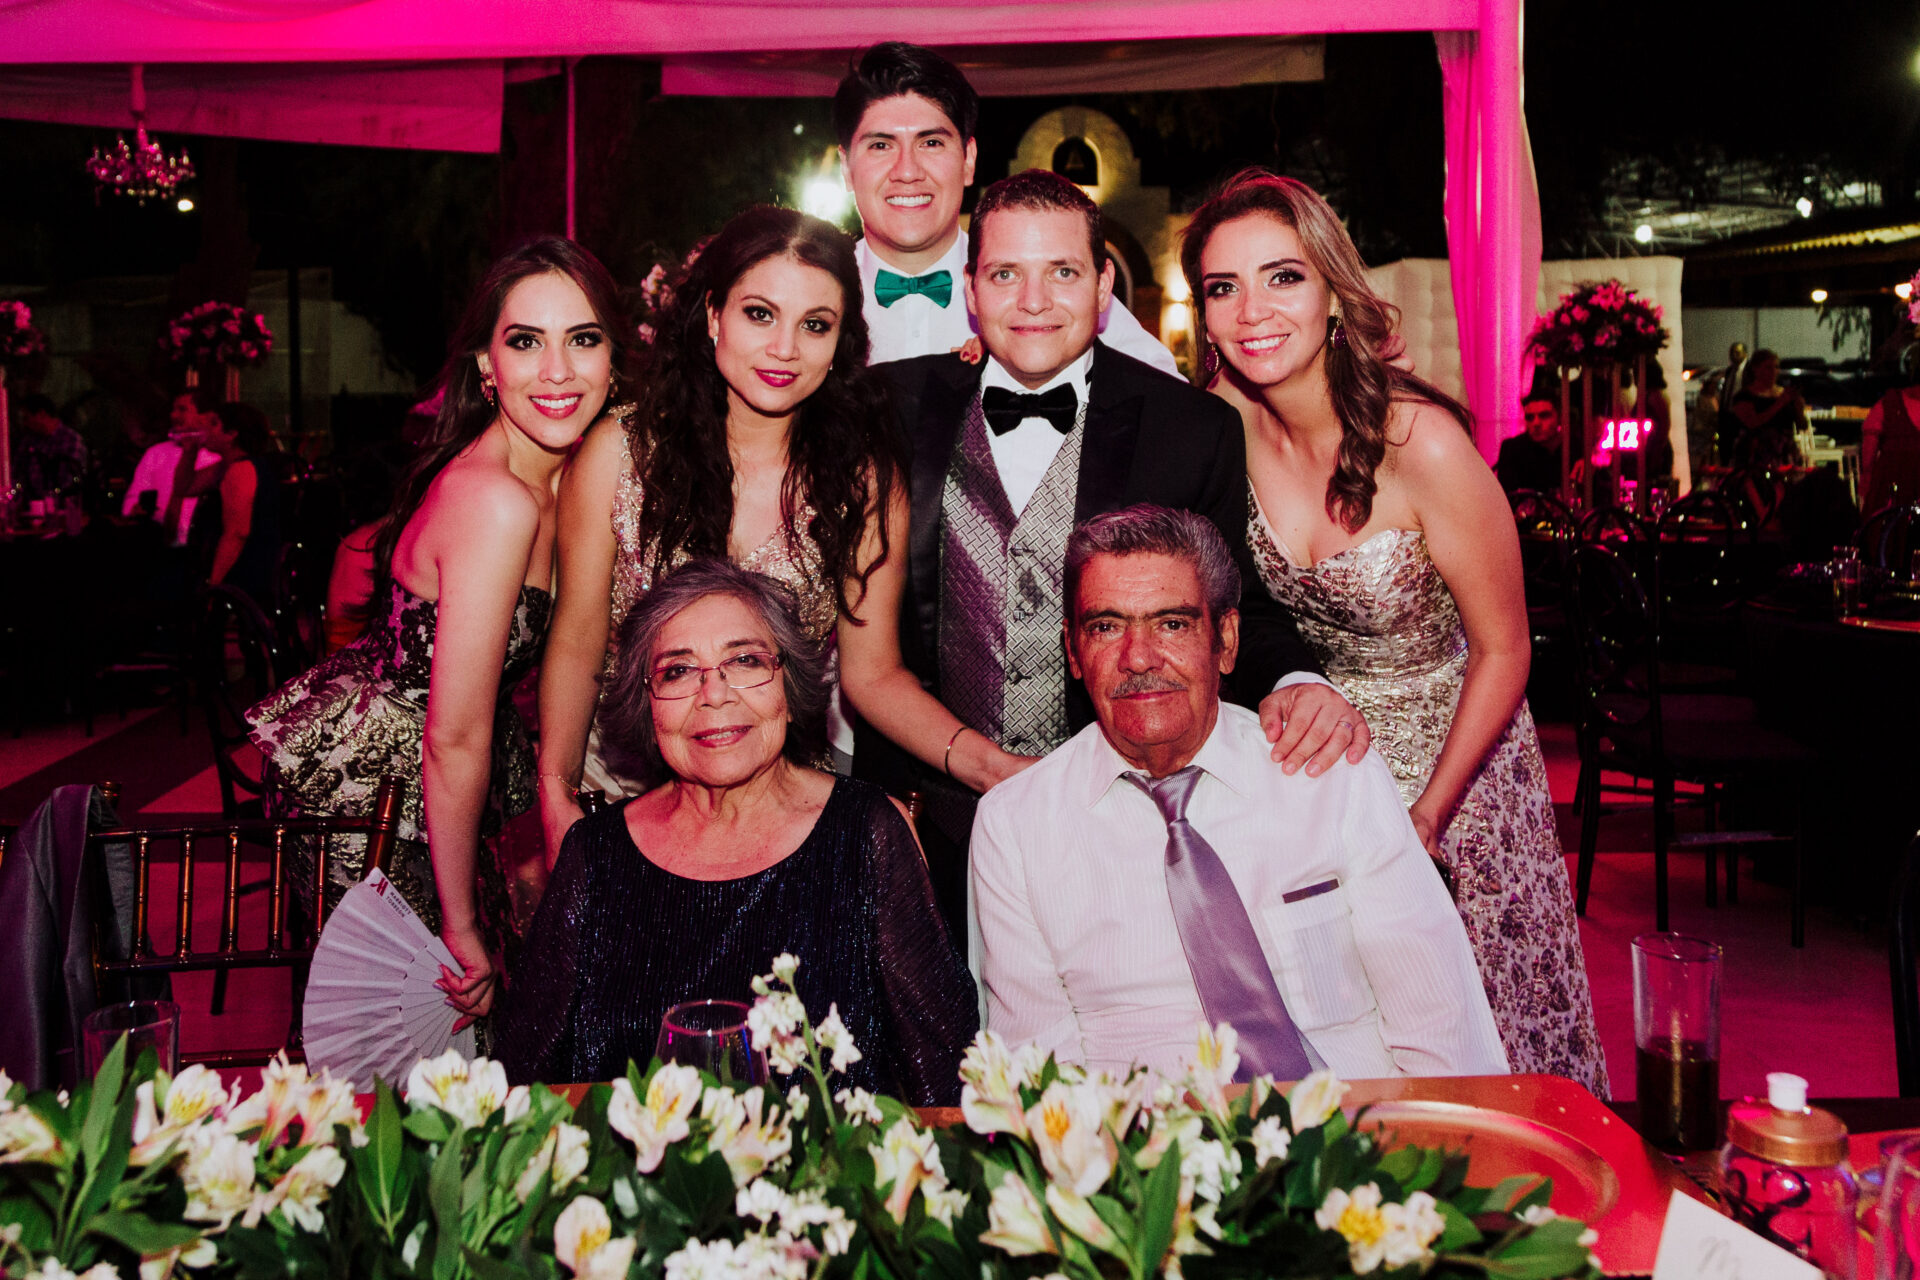 javier_noriega_fotografo_bodas_torreon_coahuila_zacatecas_wedding_photographer60a